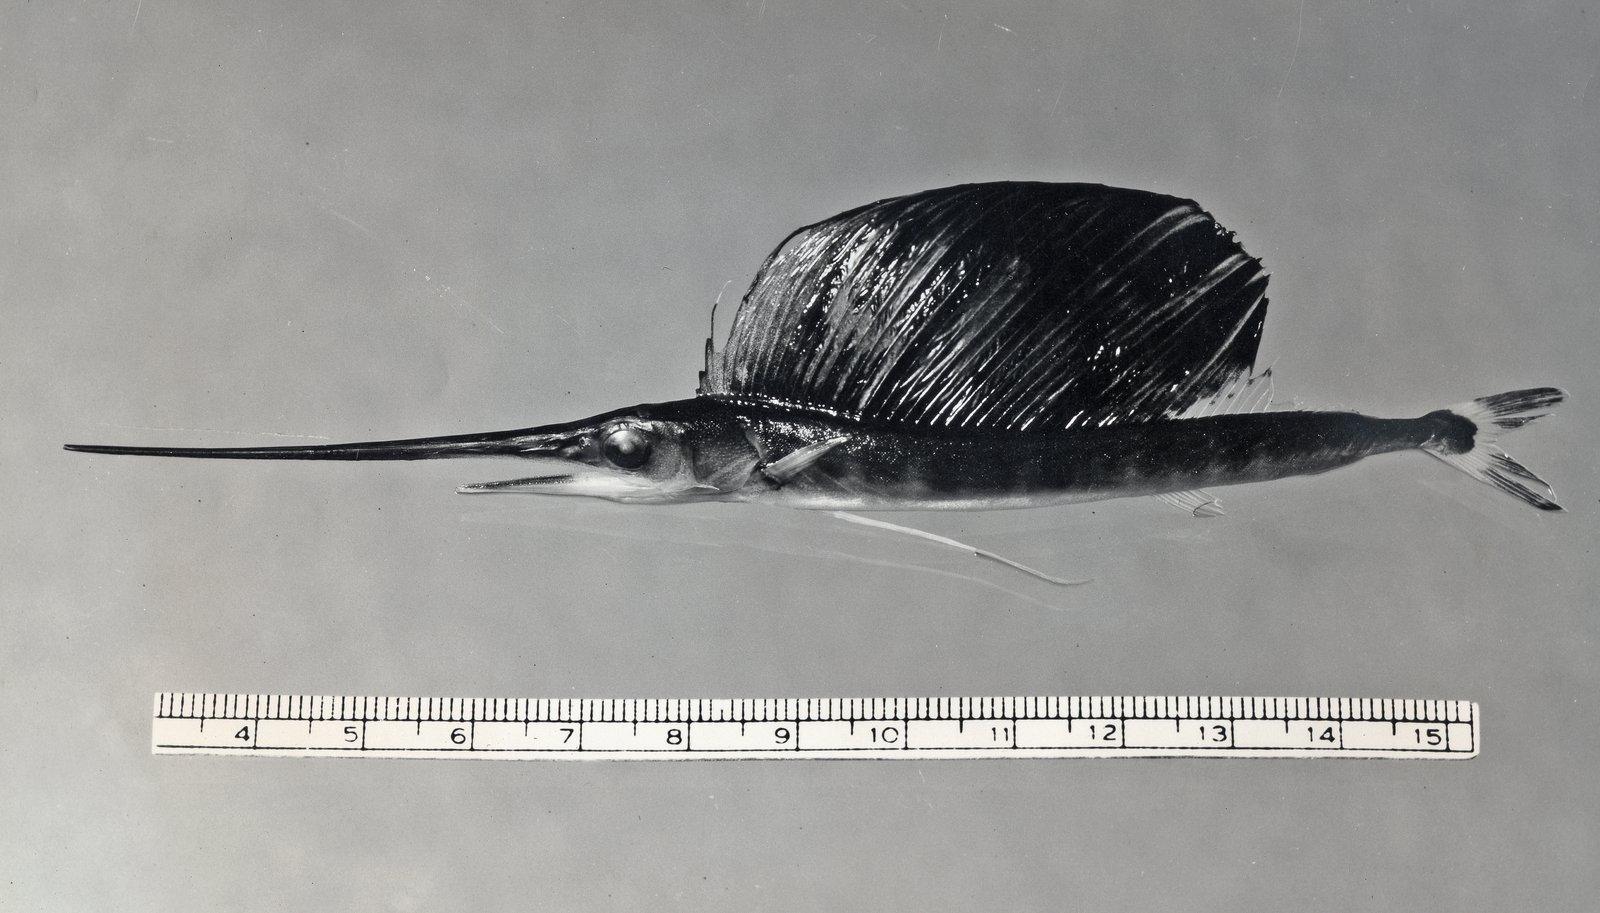 Juvenile Indo-Pacific Sailfish, <i>Istiophorus platypterus</i>